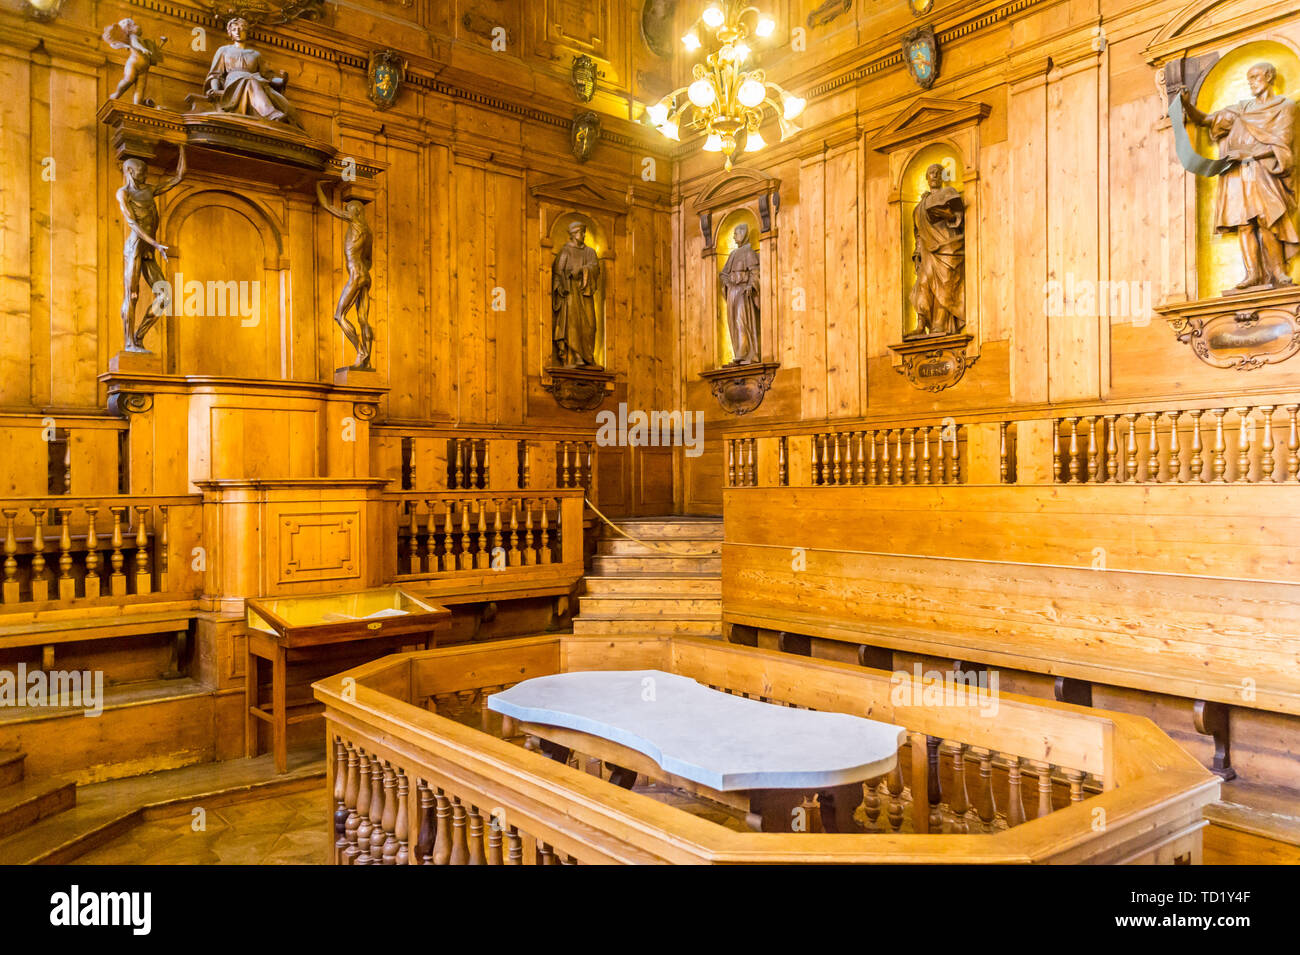 anatomy-theatre-by-antonio-paolucci-il-levanti-1637-archiginnasio-university-of-bologna-emilia-romagna-italy-TD1Y4F.jpg